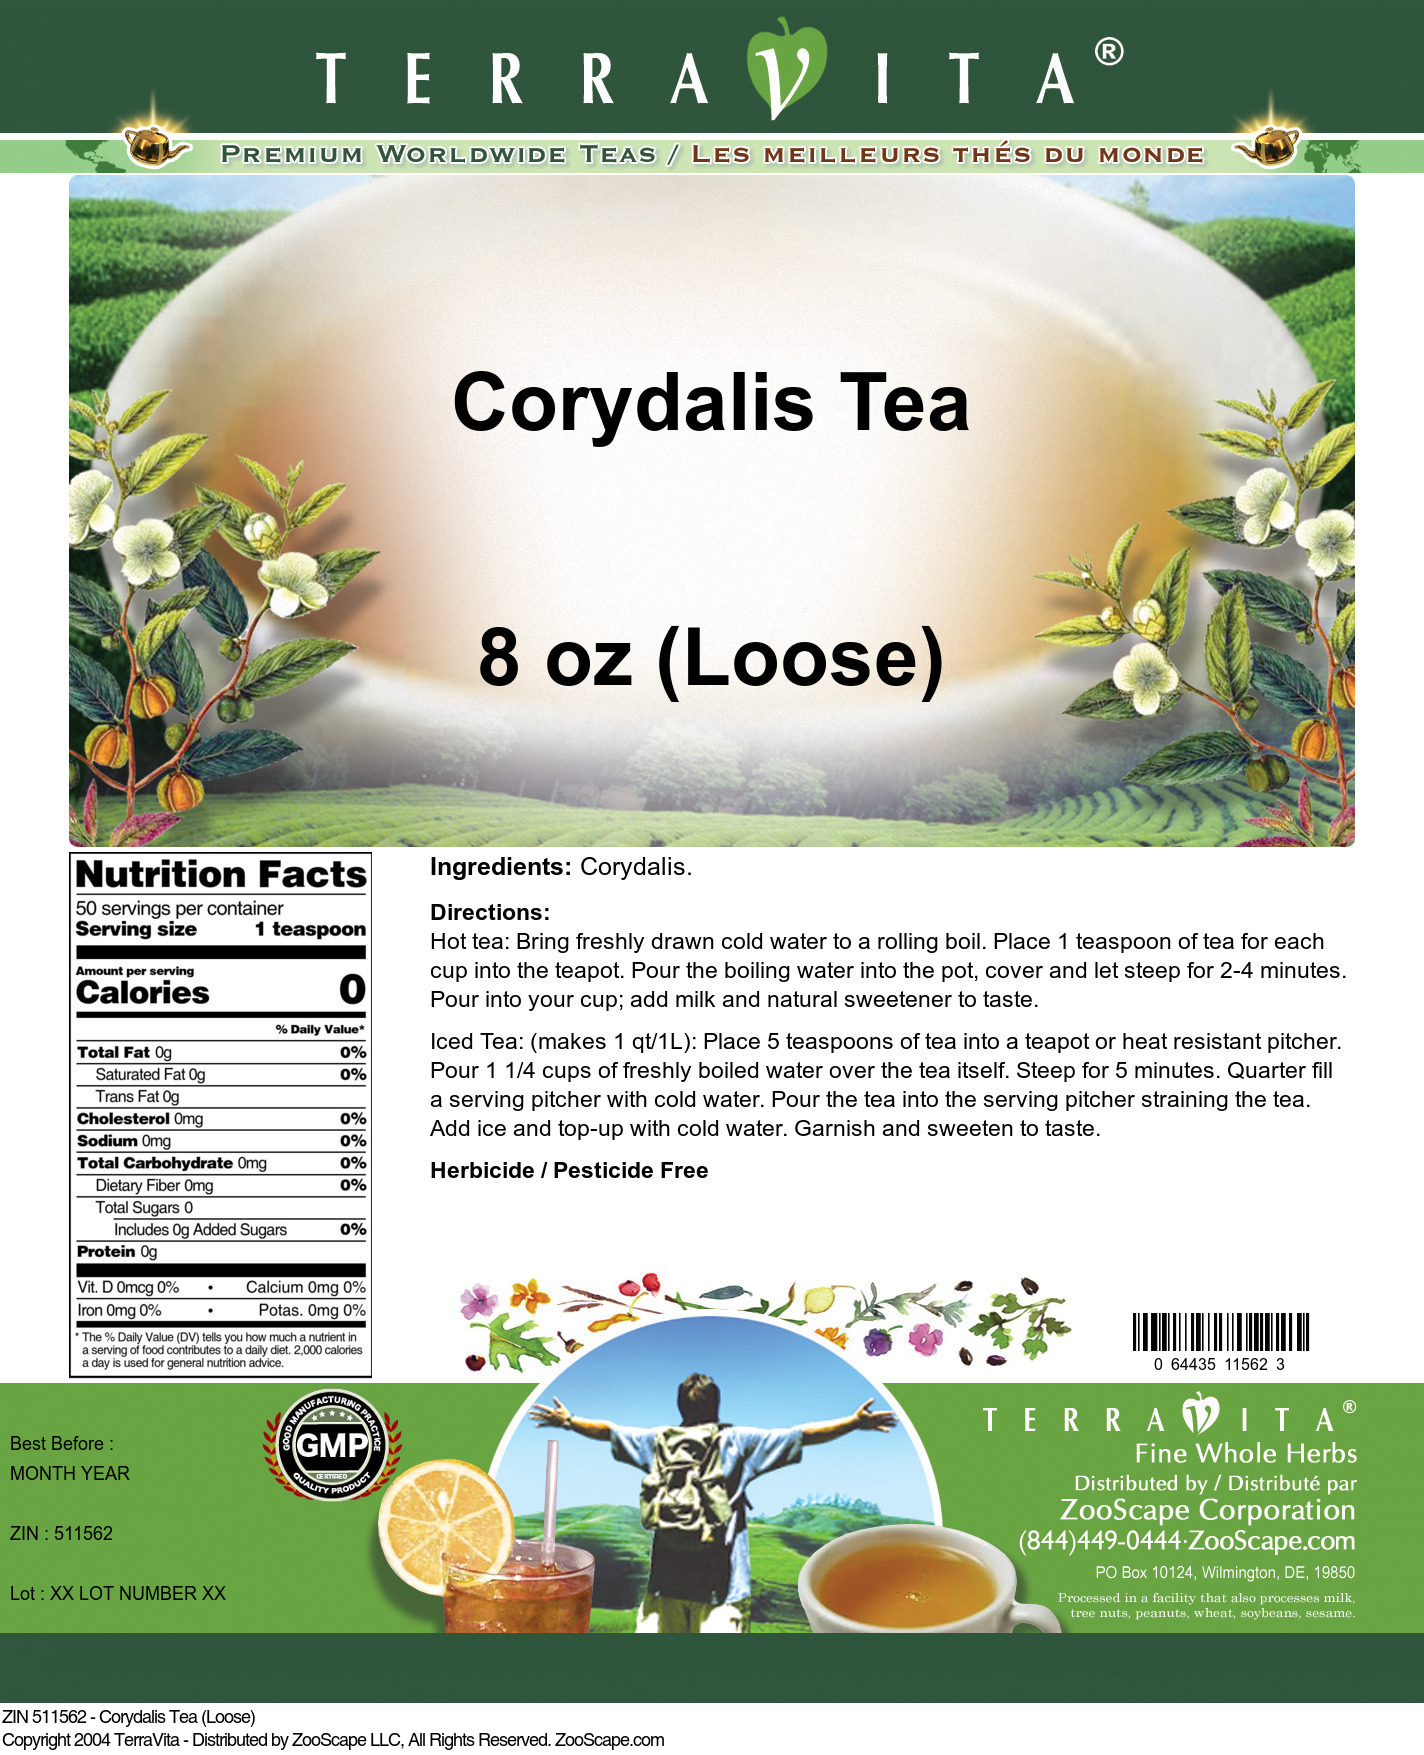 Corydalis Tea (Loose)